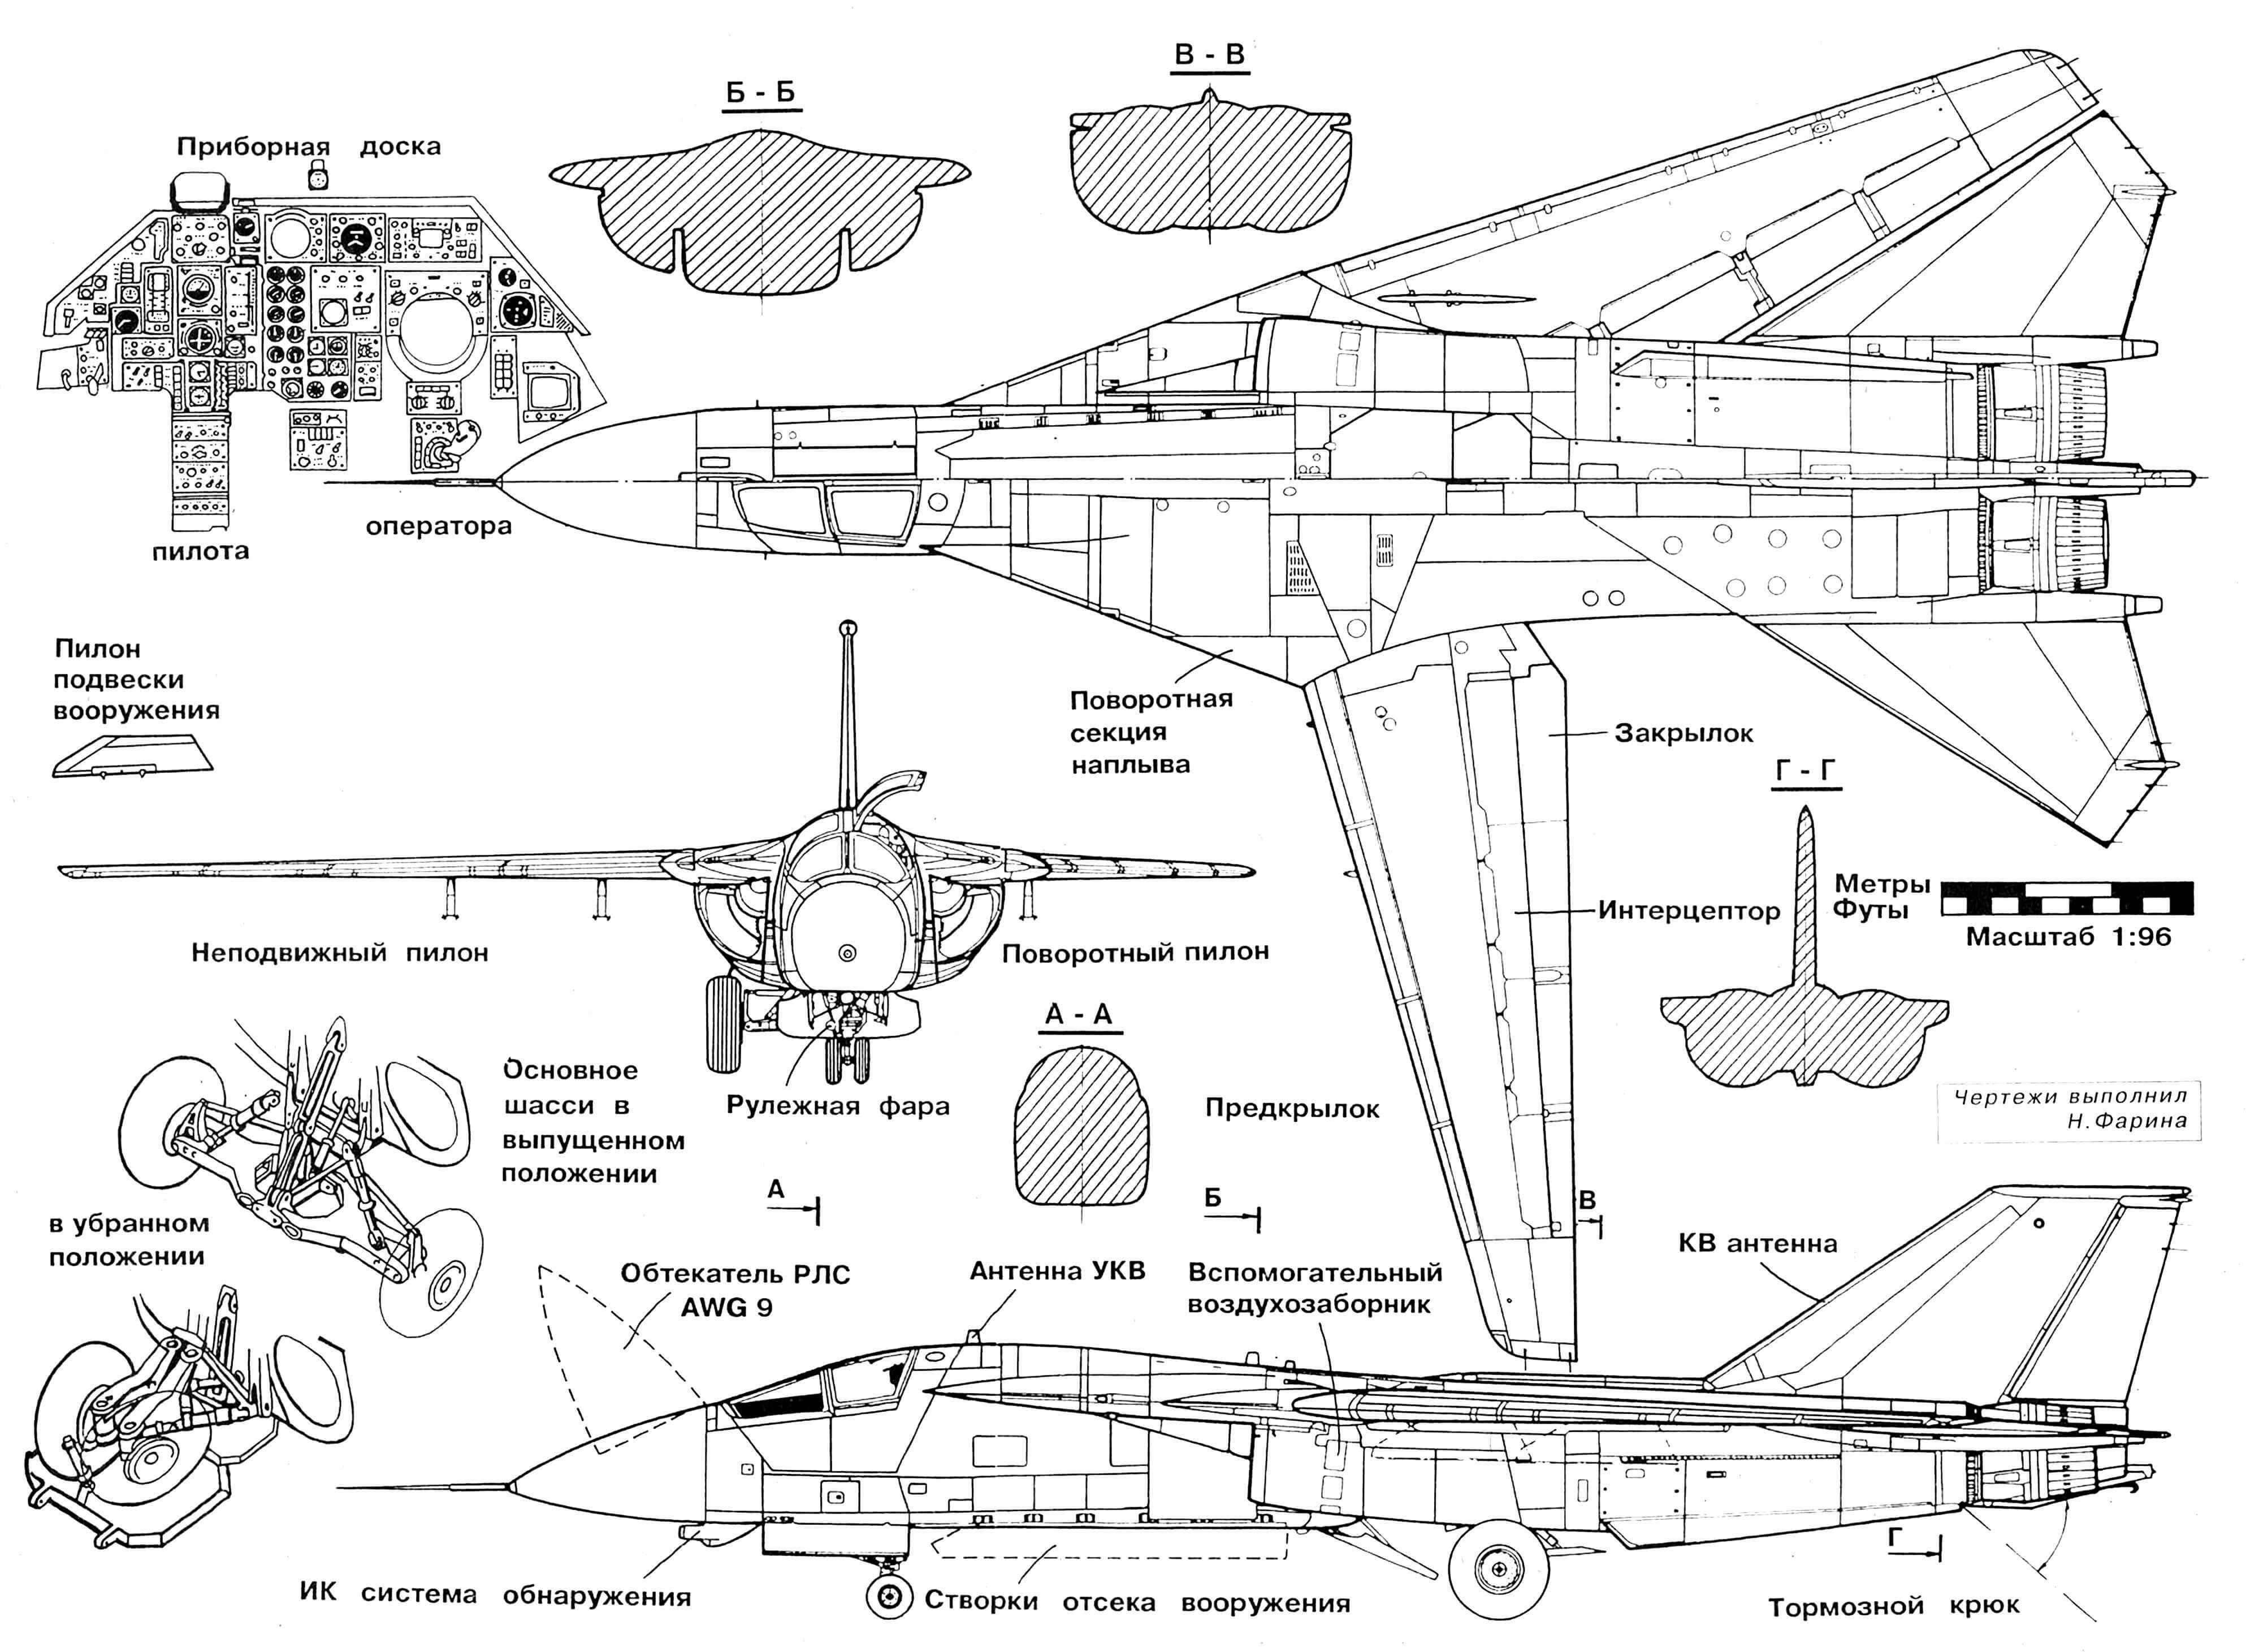 Grumman F-111B